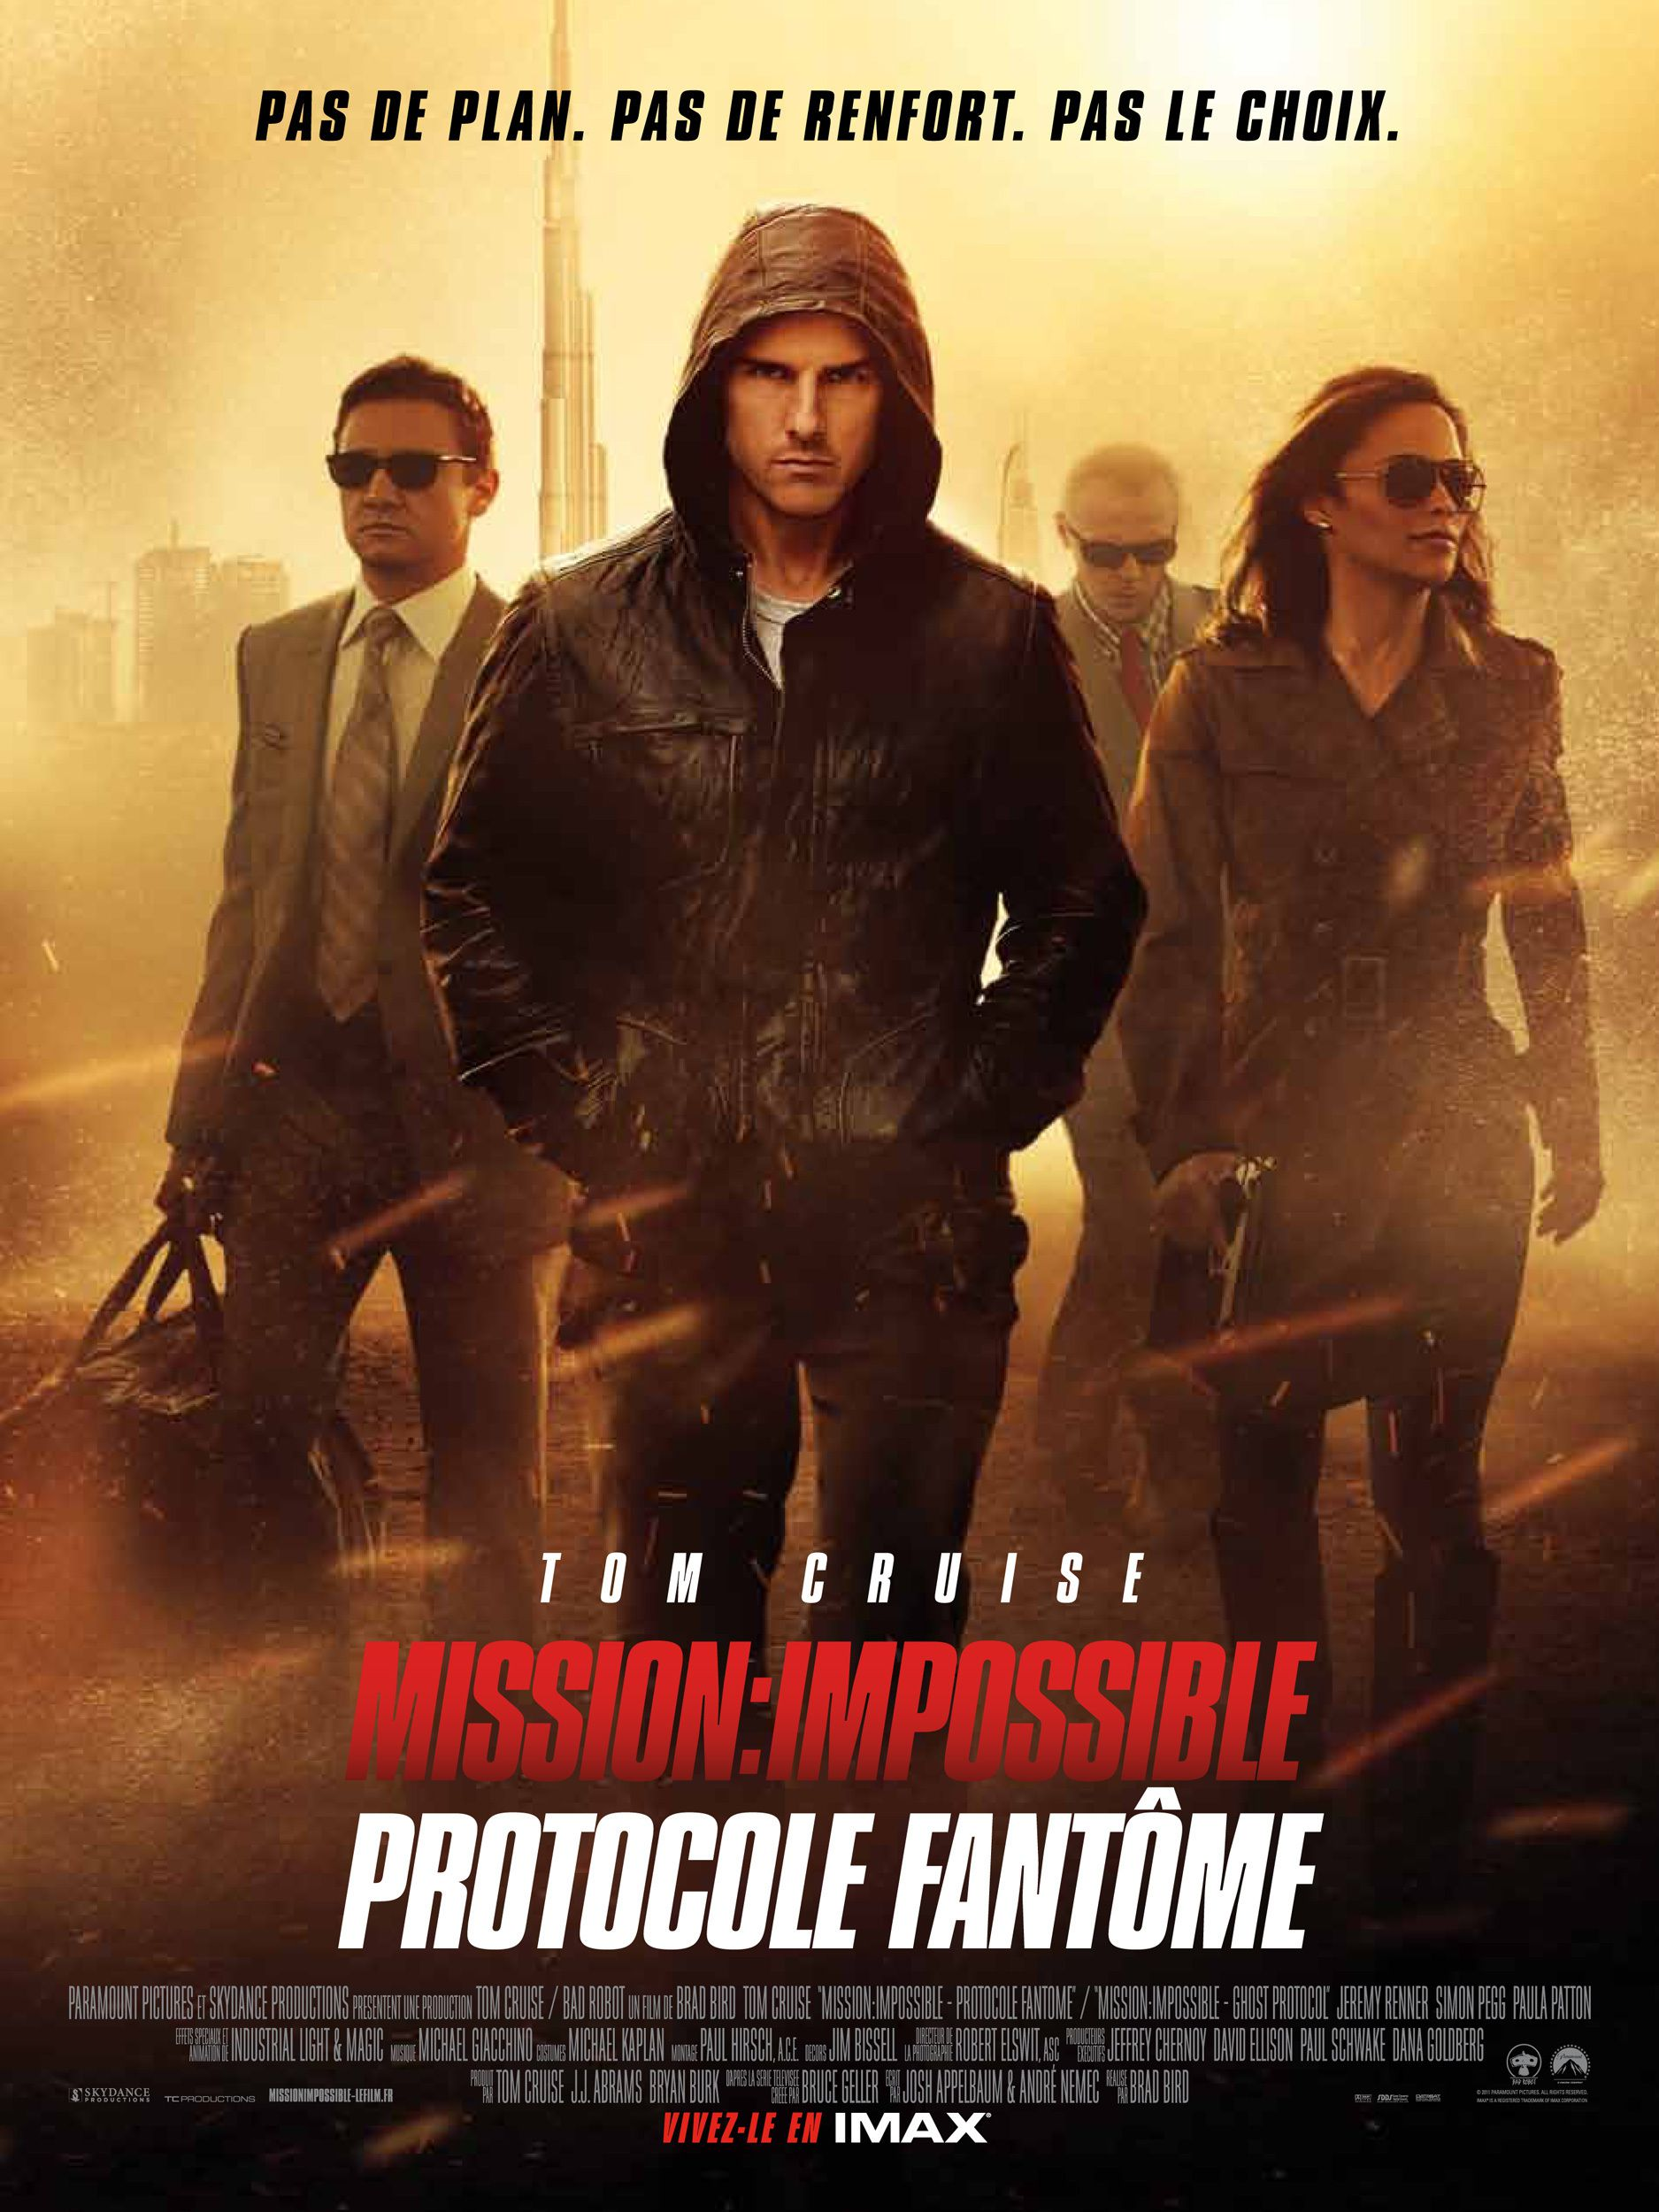 Mission : Impossible - Protocole fantôme - Film (2011)